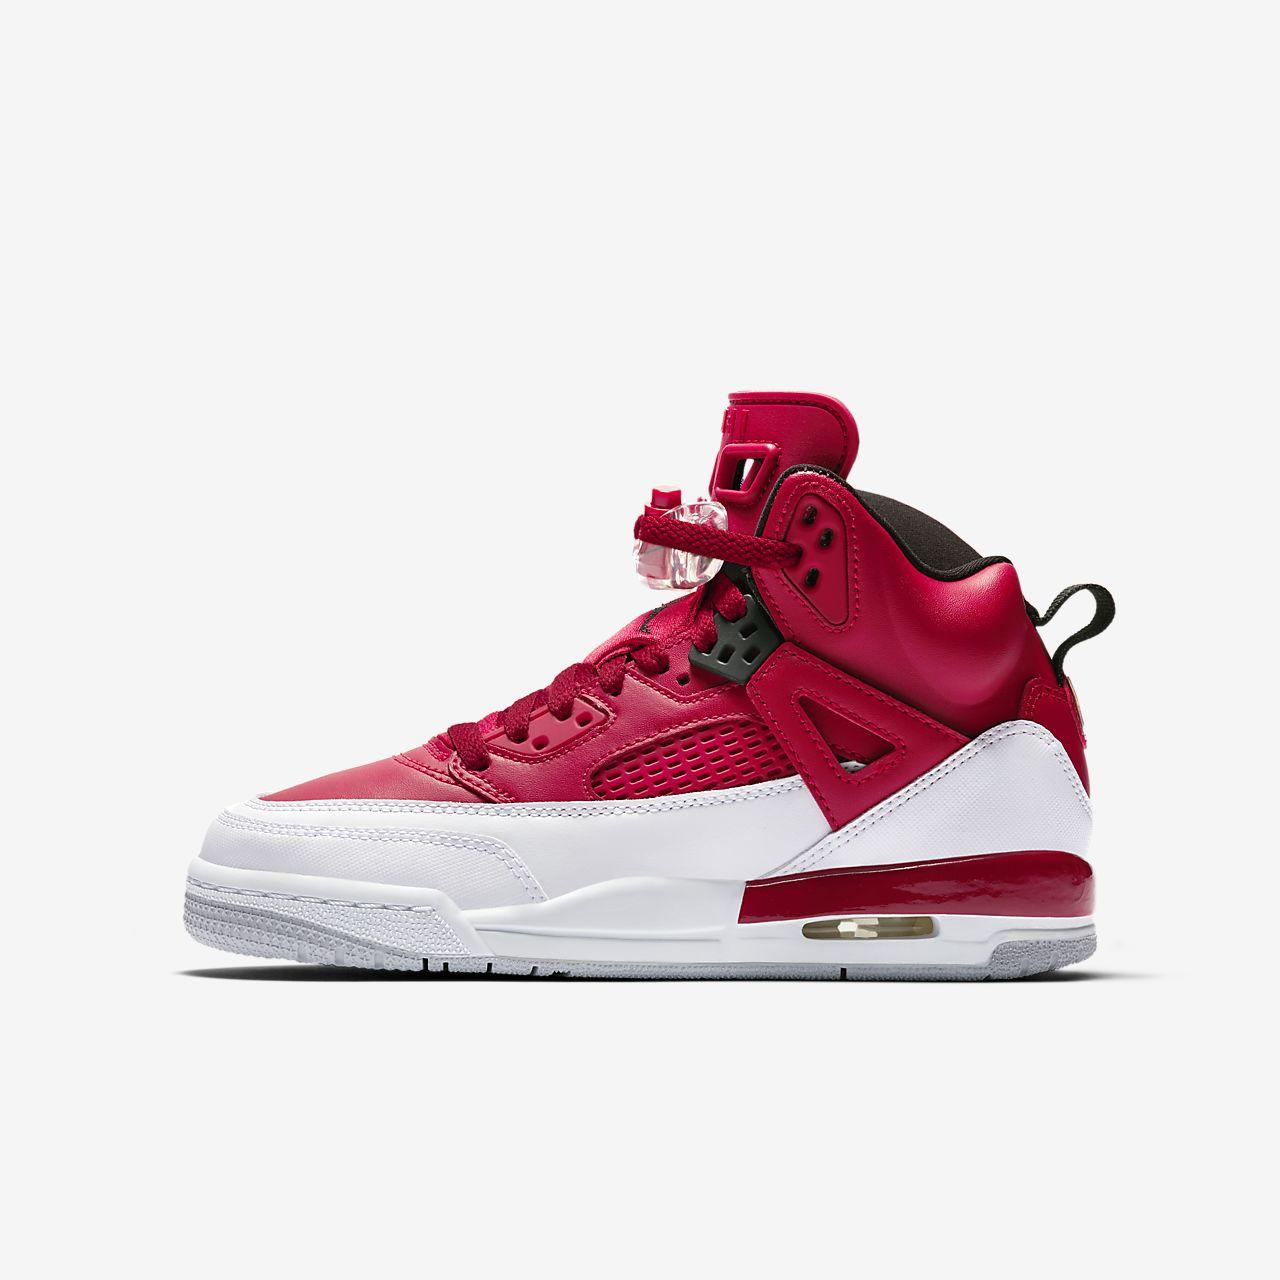 Jordan Shoes Spizike